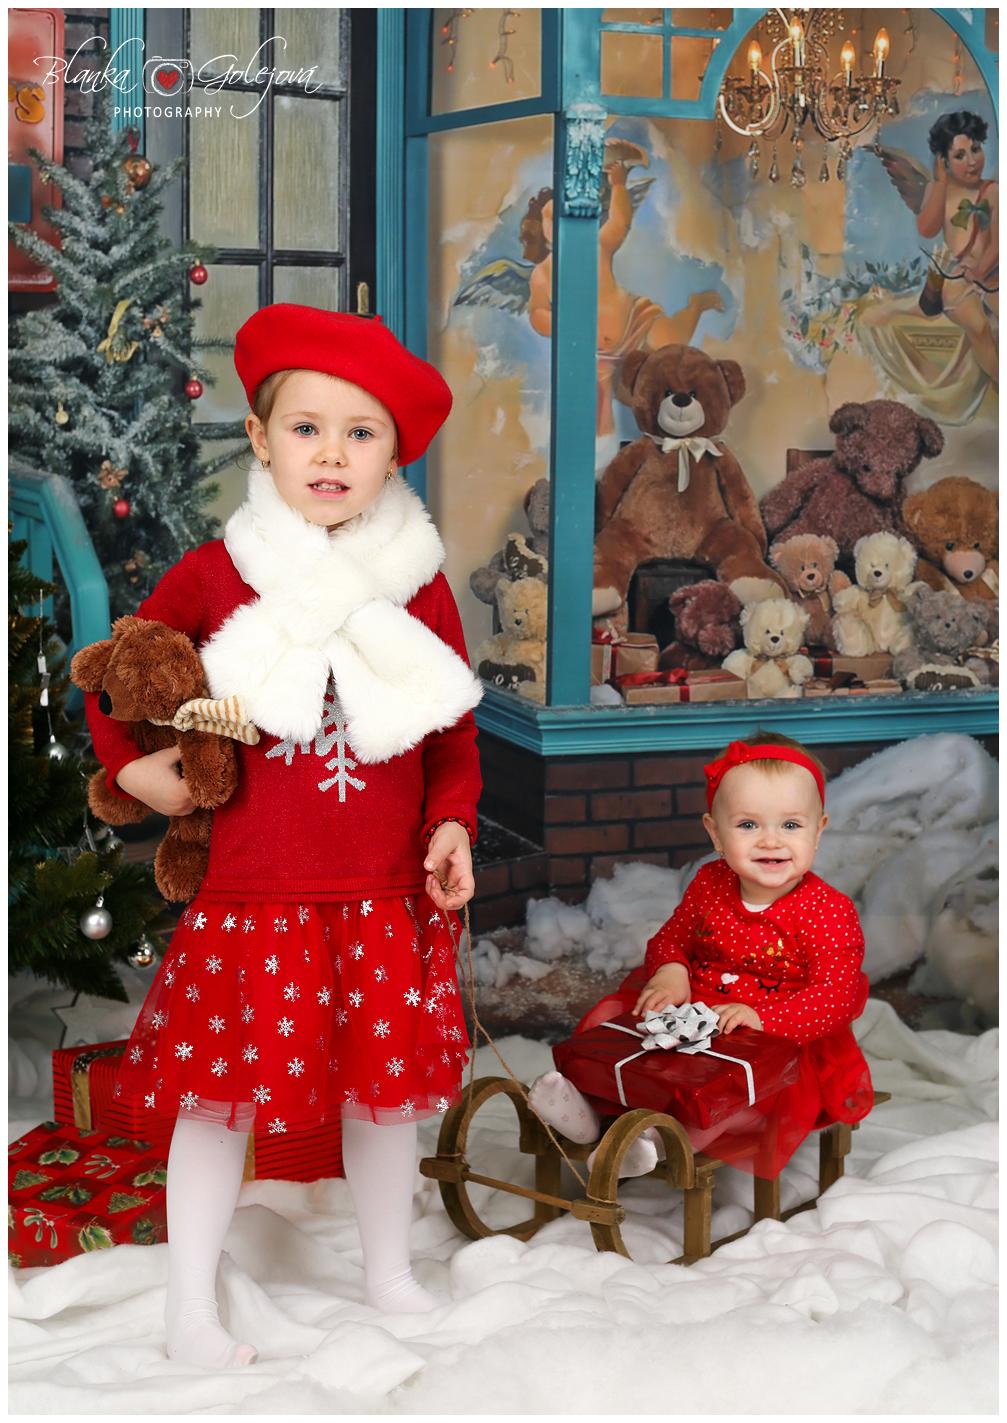 Vianocne fotografie s detmi